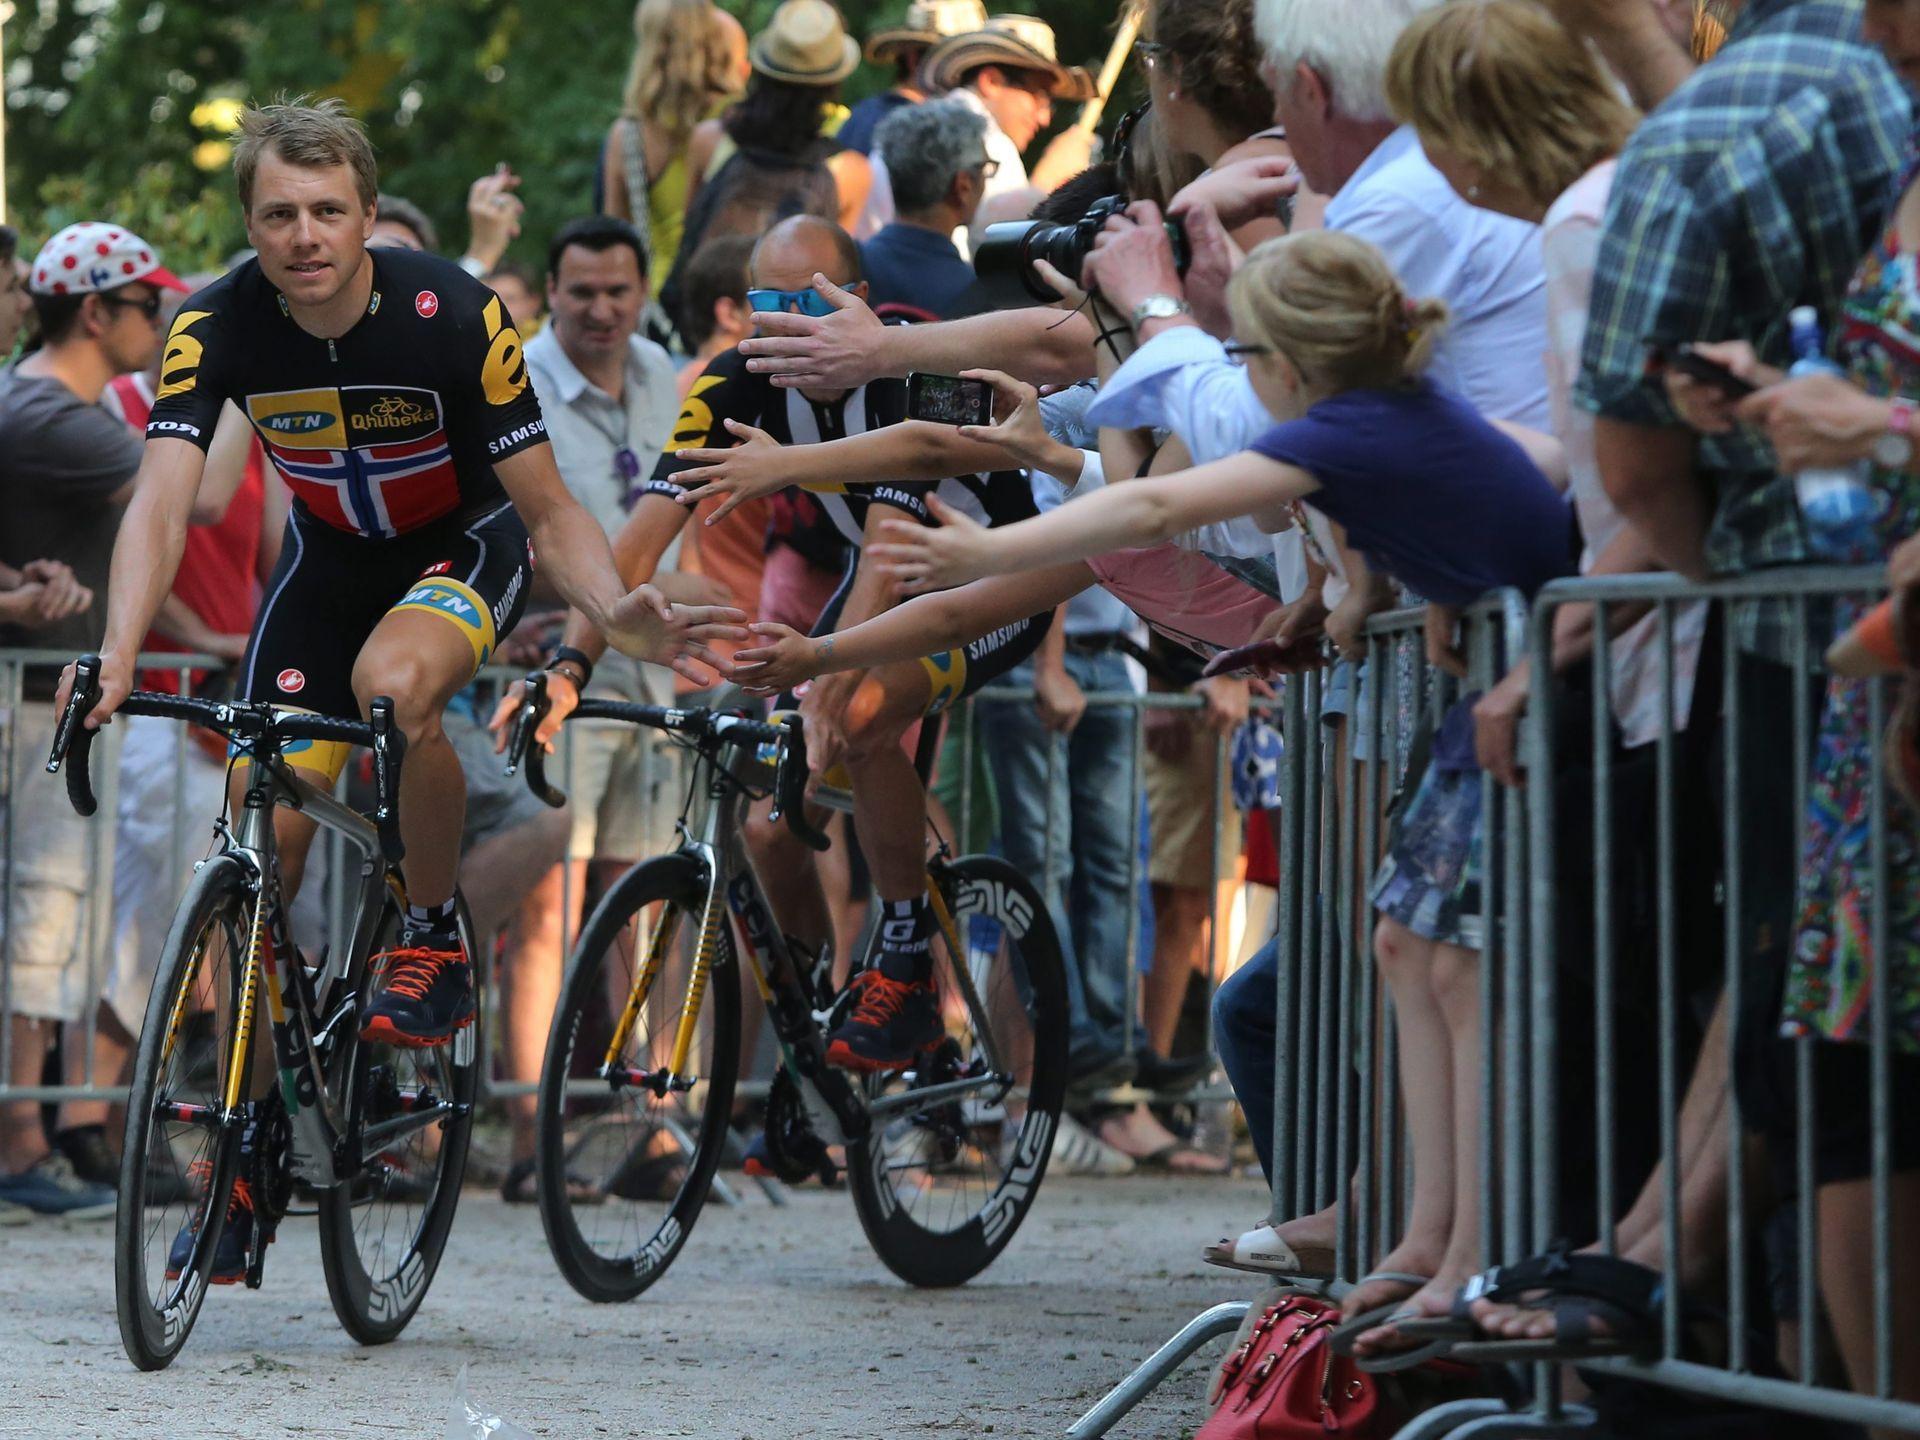 Edvald Boasson Hagen from Team MTN-Qhubeka greets fans